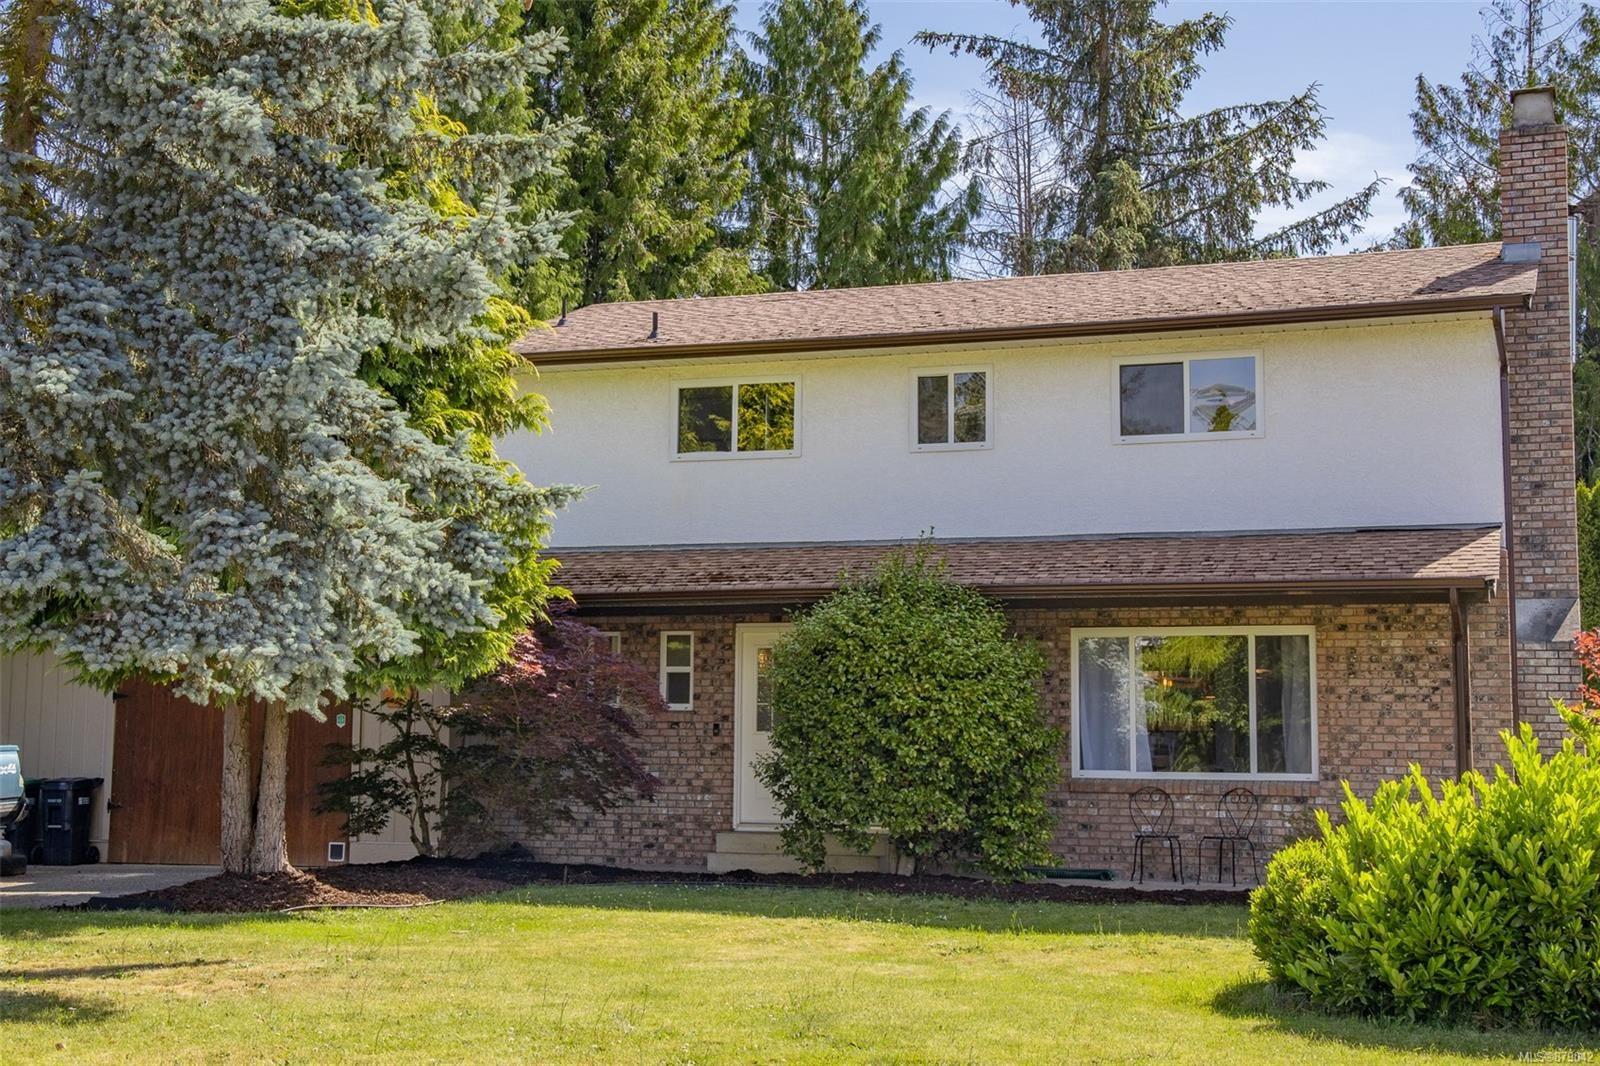 Main Photo: 350 McKinnon St in : PQ Parksville House for sale (Parksville/Qualicum)  : MLS®# 879042